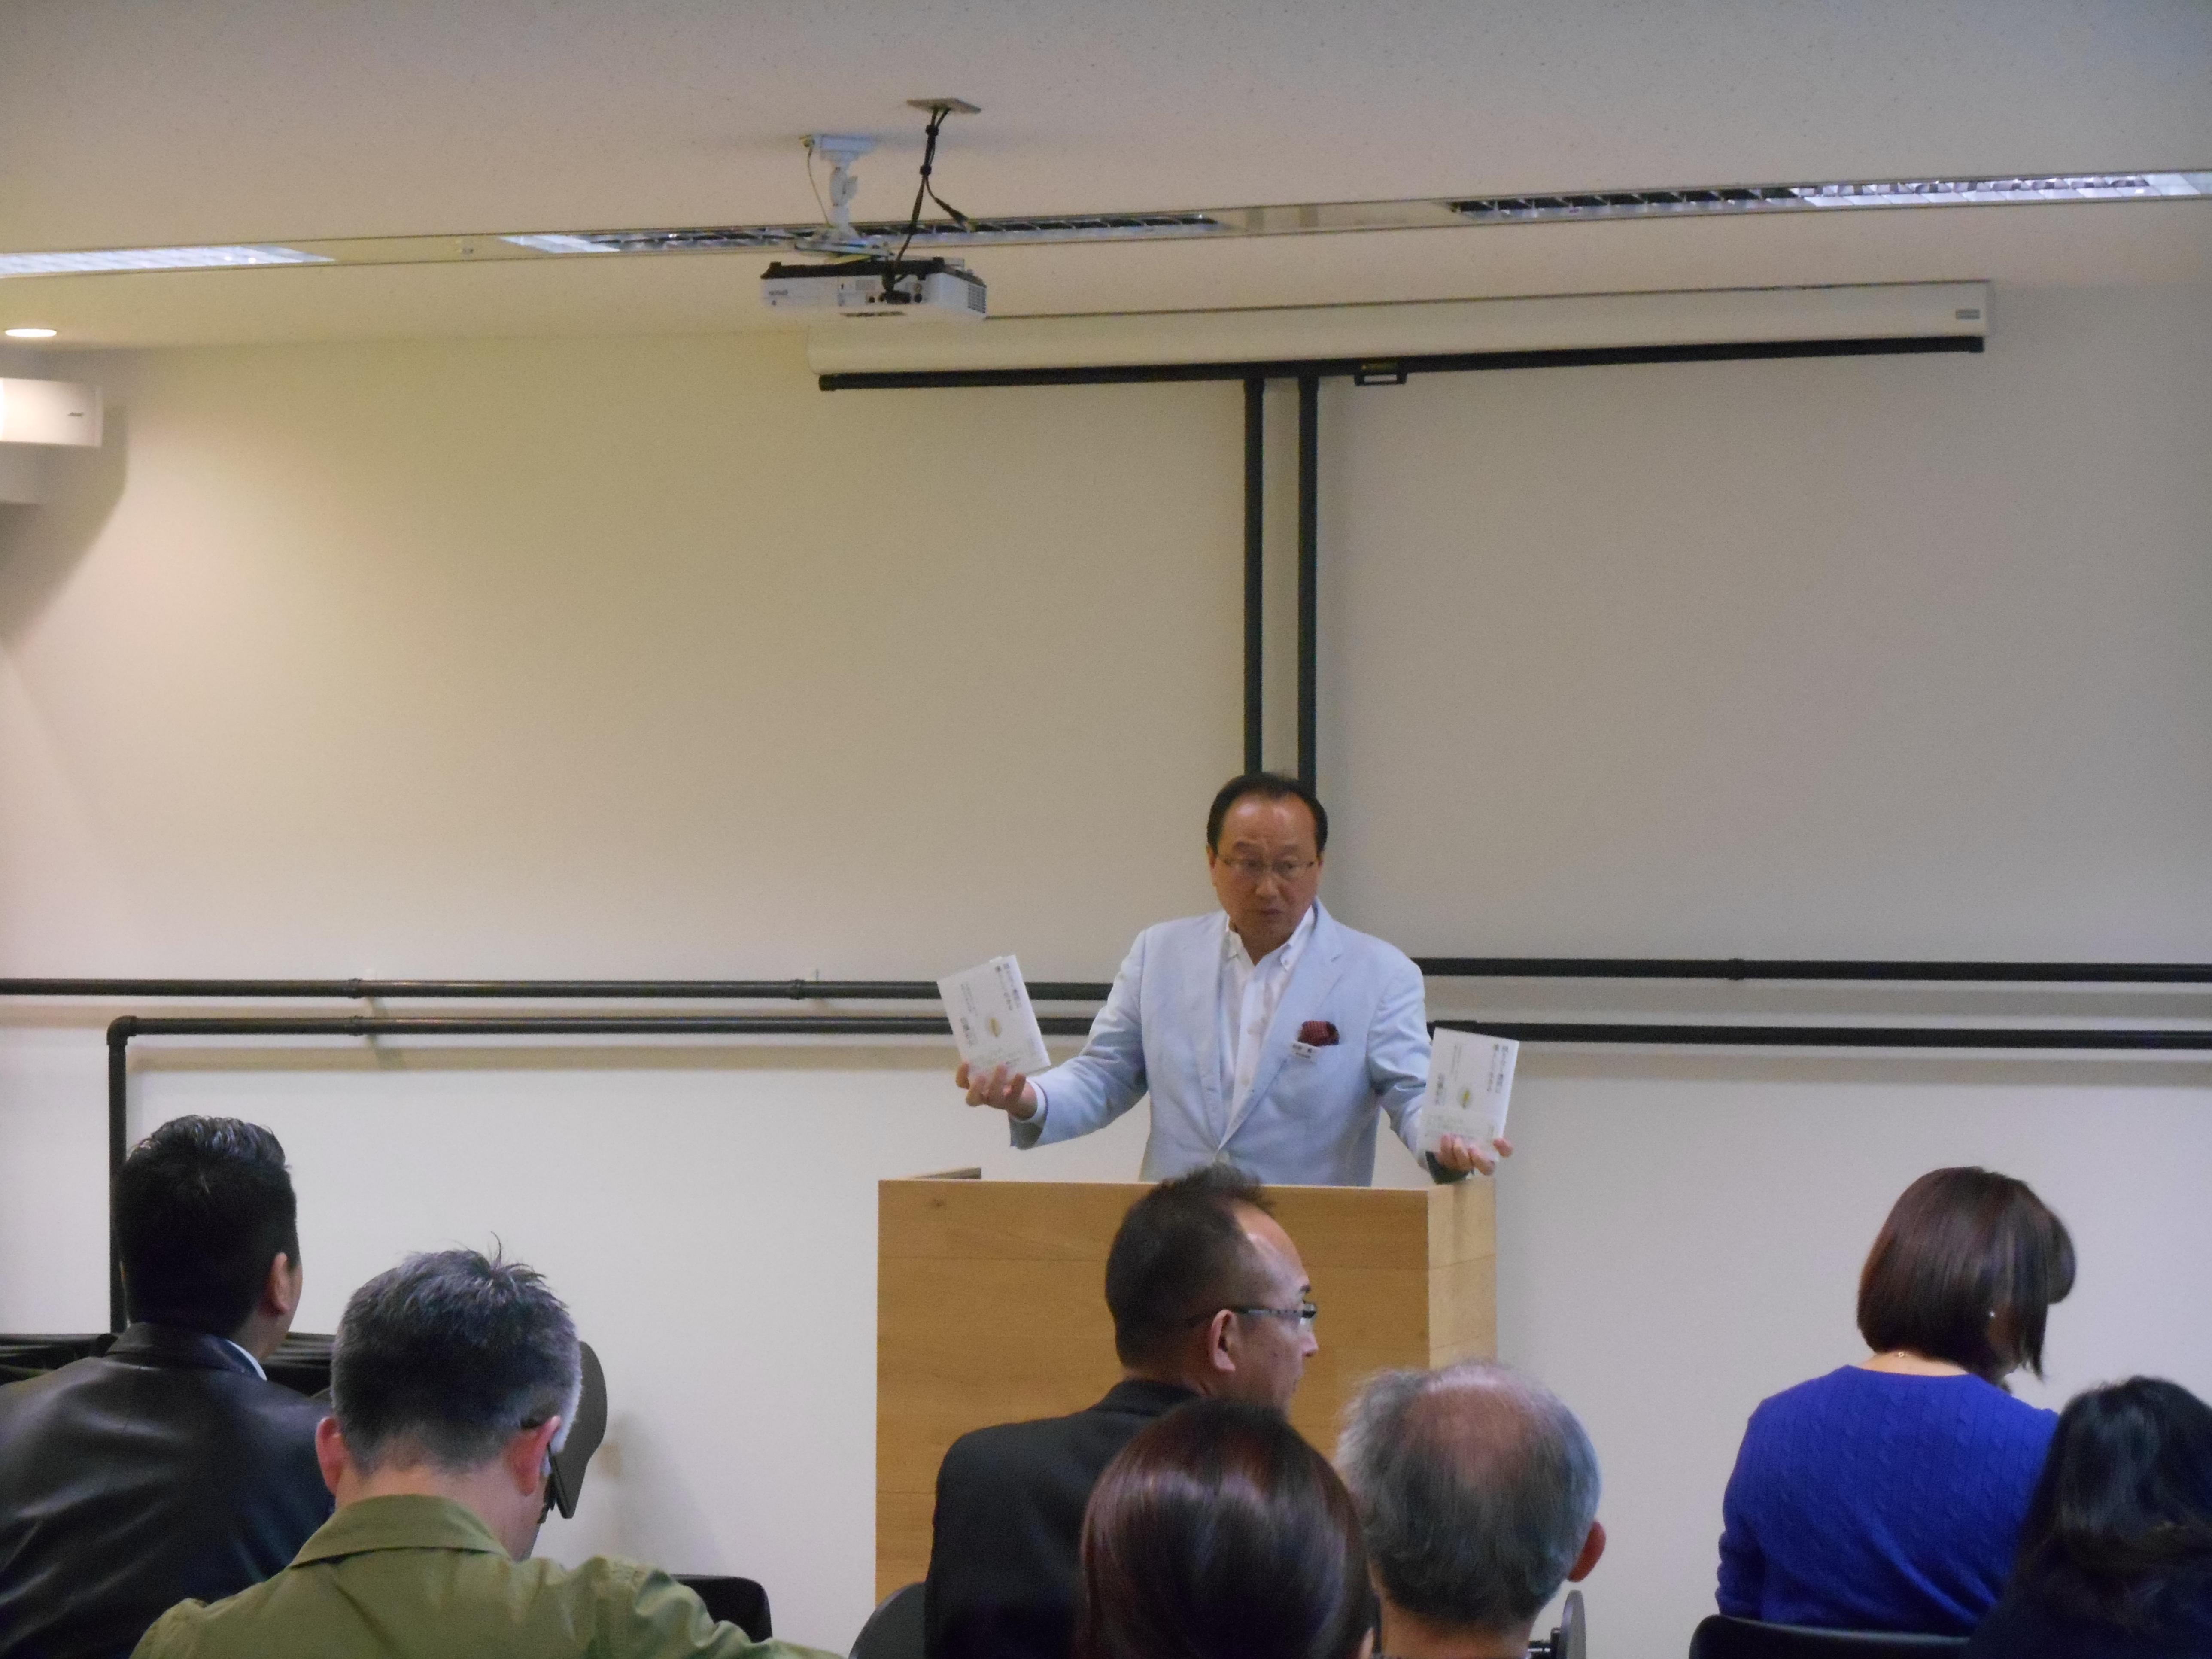 DSCN3708 - 平成30年度 東京思風塾 4月7日(土)「時代が問題をつくり、問題が人物をつくる」